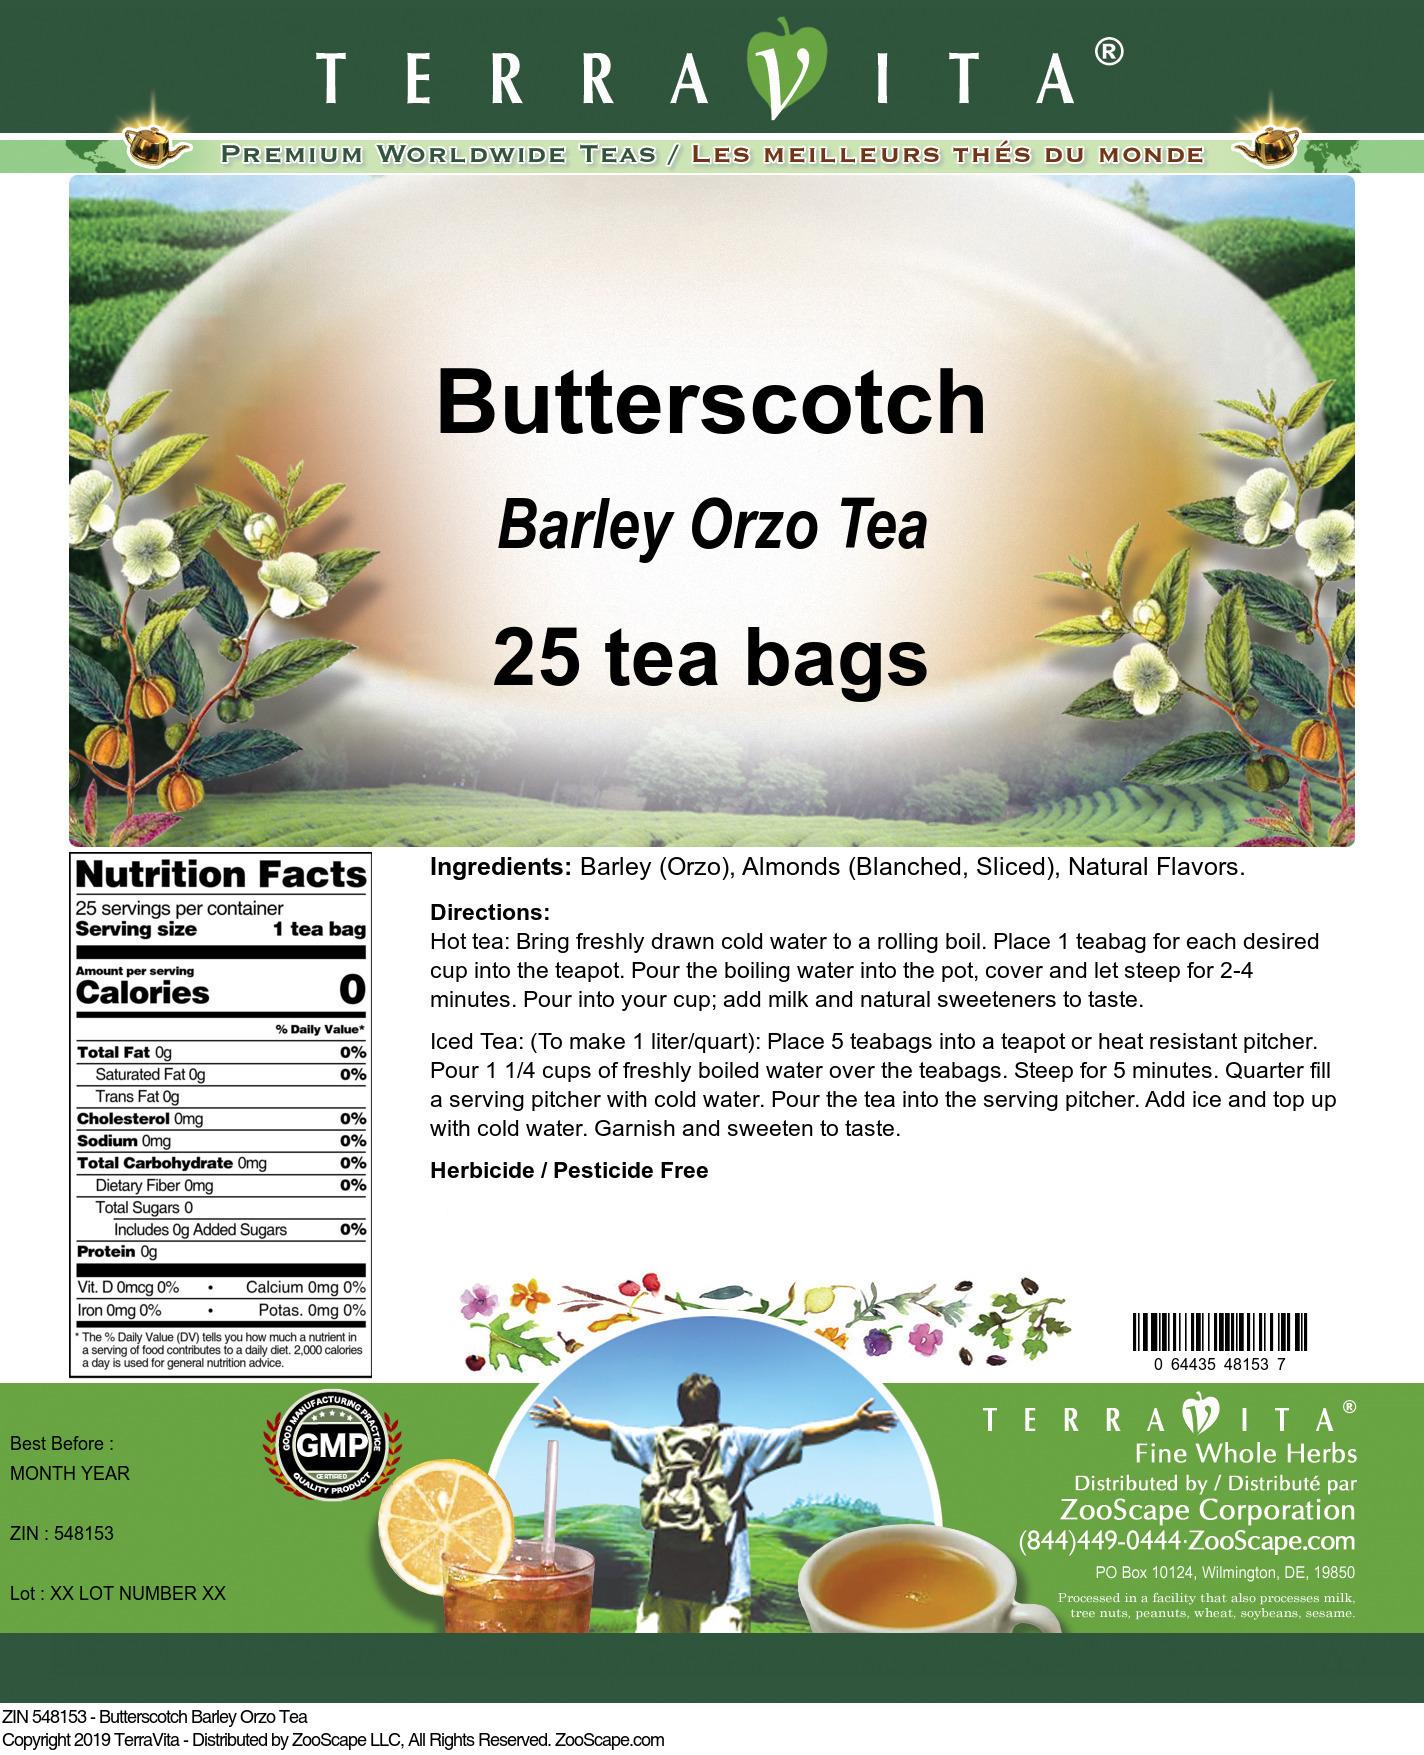 Butterscotch Barley Orzo Tea